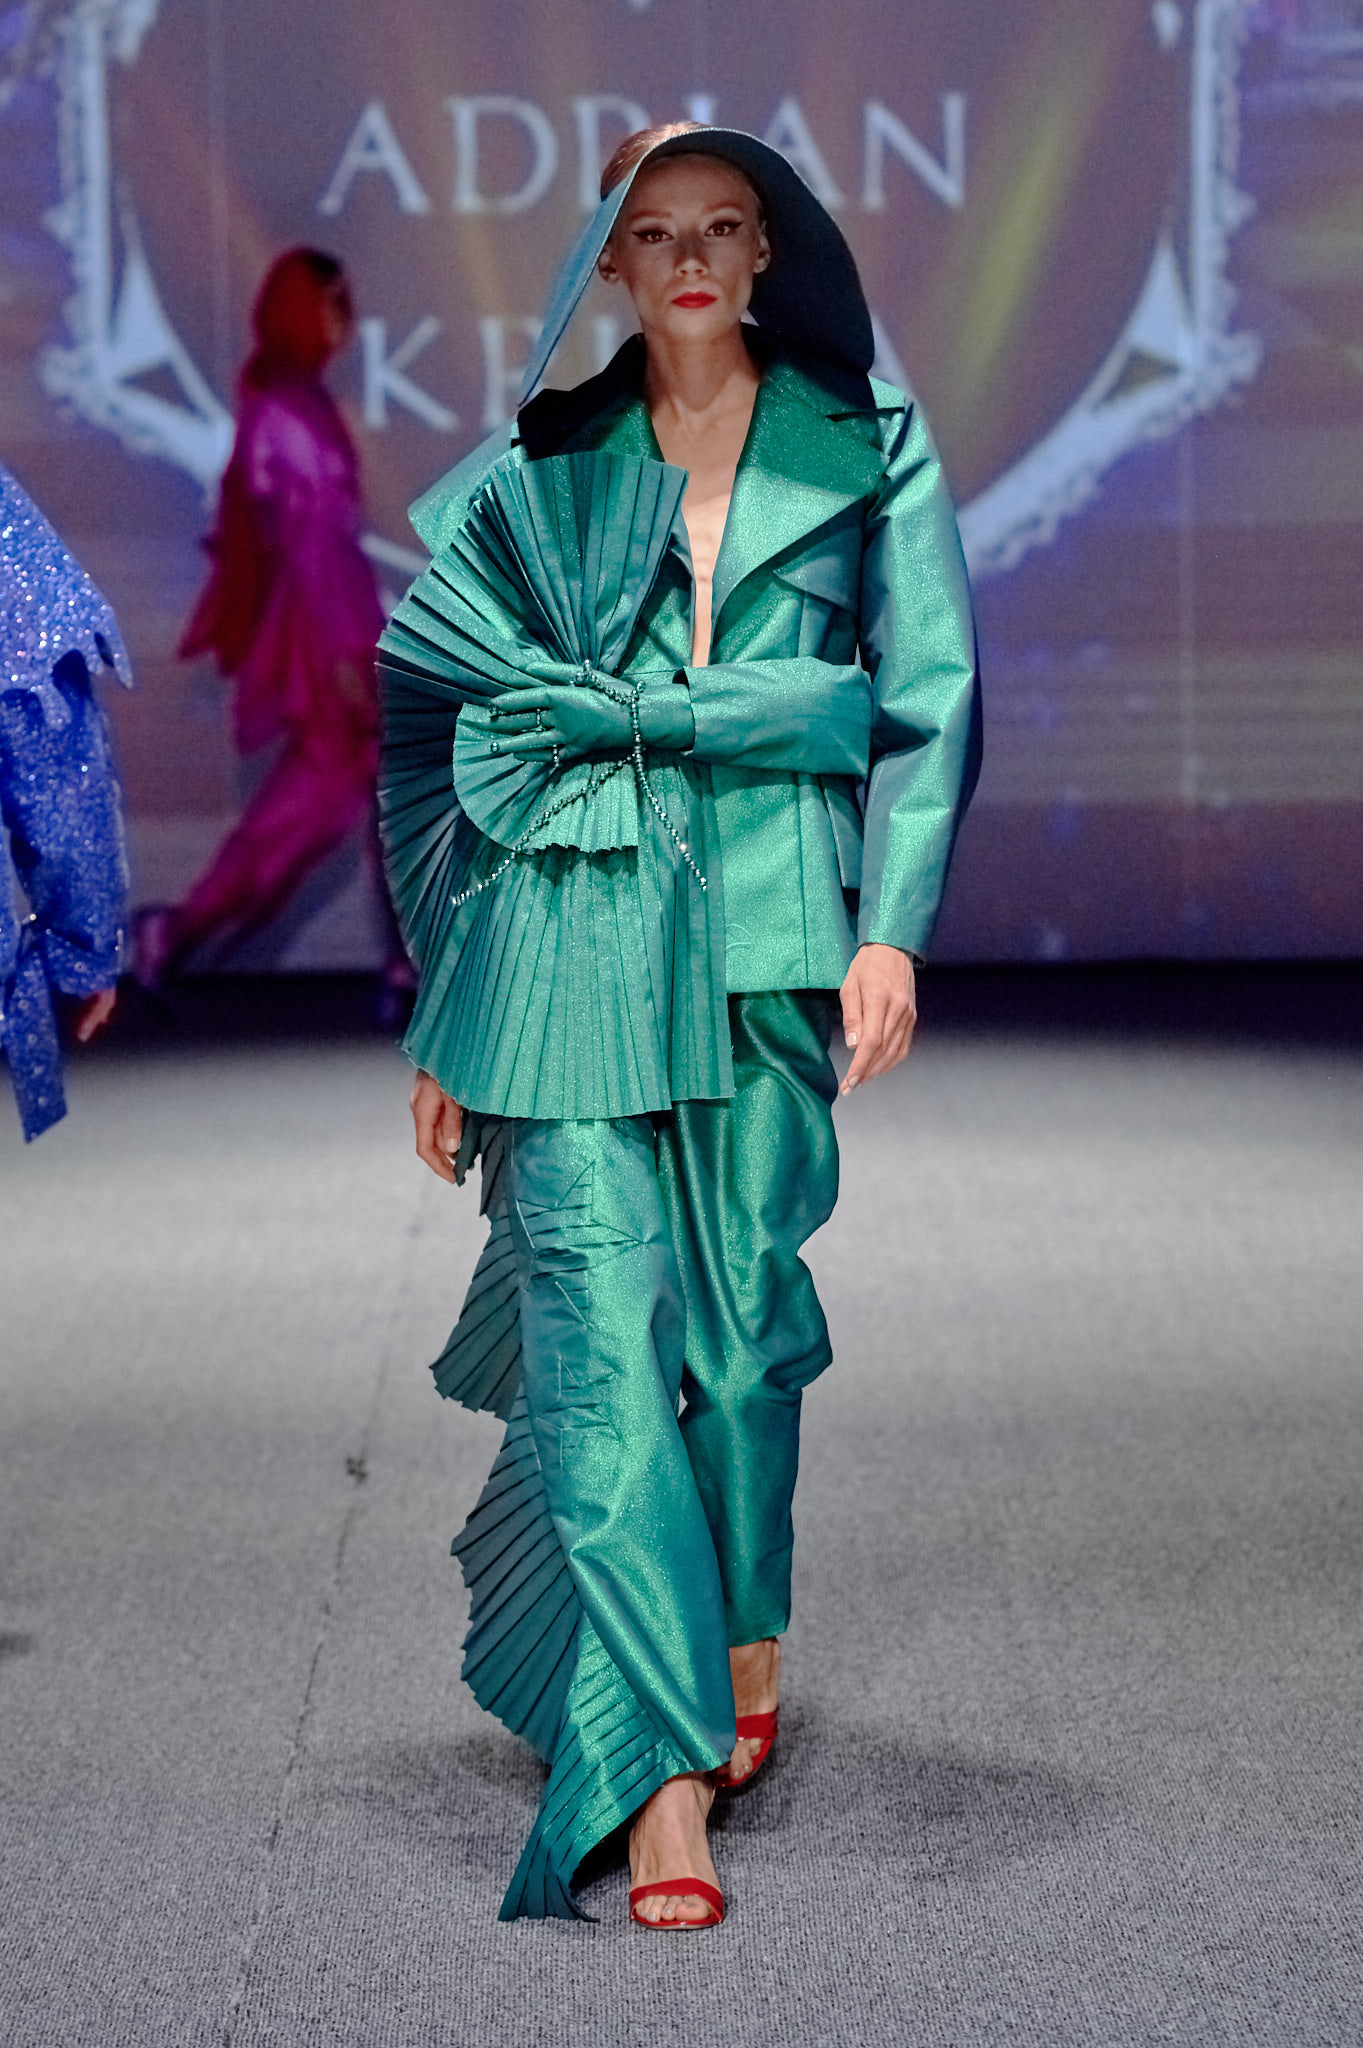 Kolekcja Adriana Krupy /fot. Filip Okopny - Fashion Images